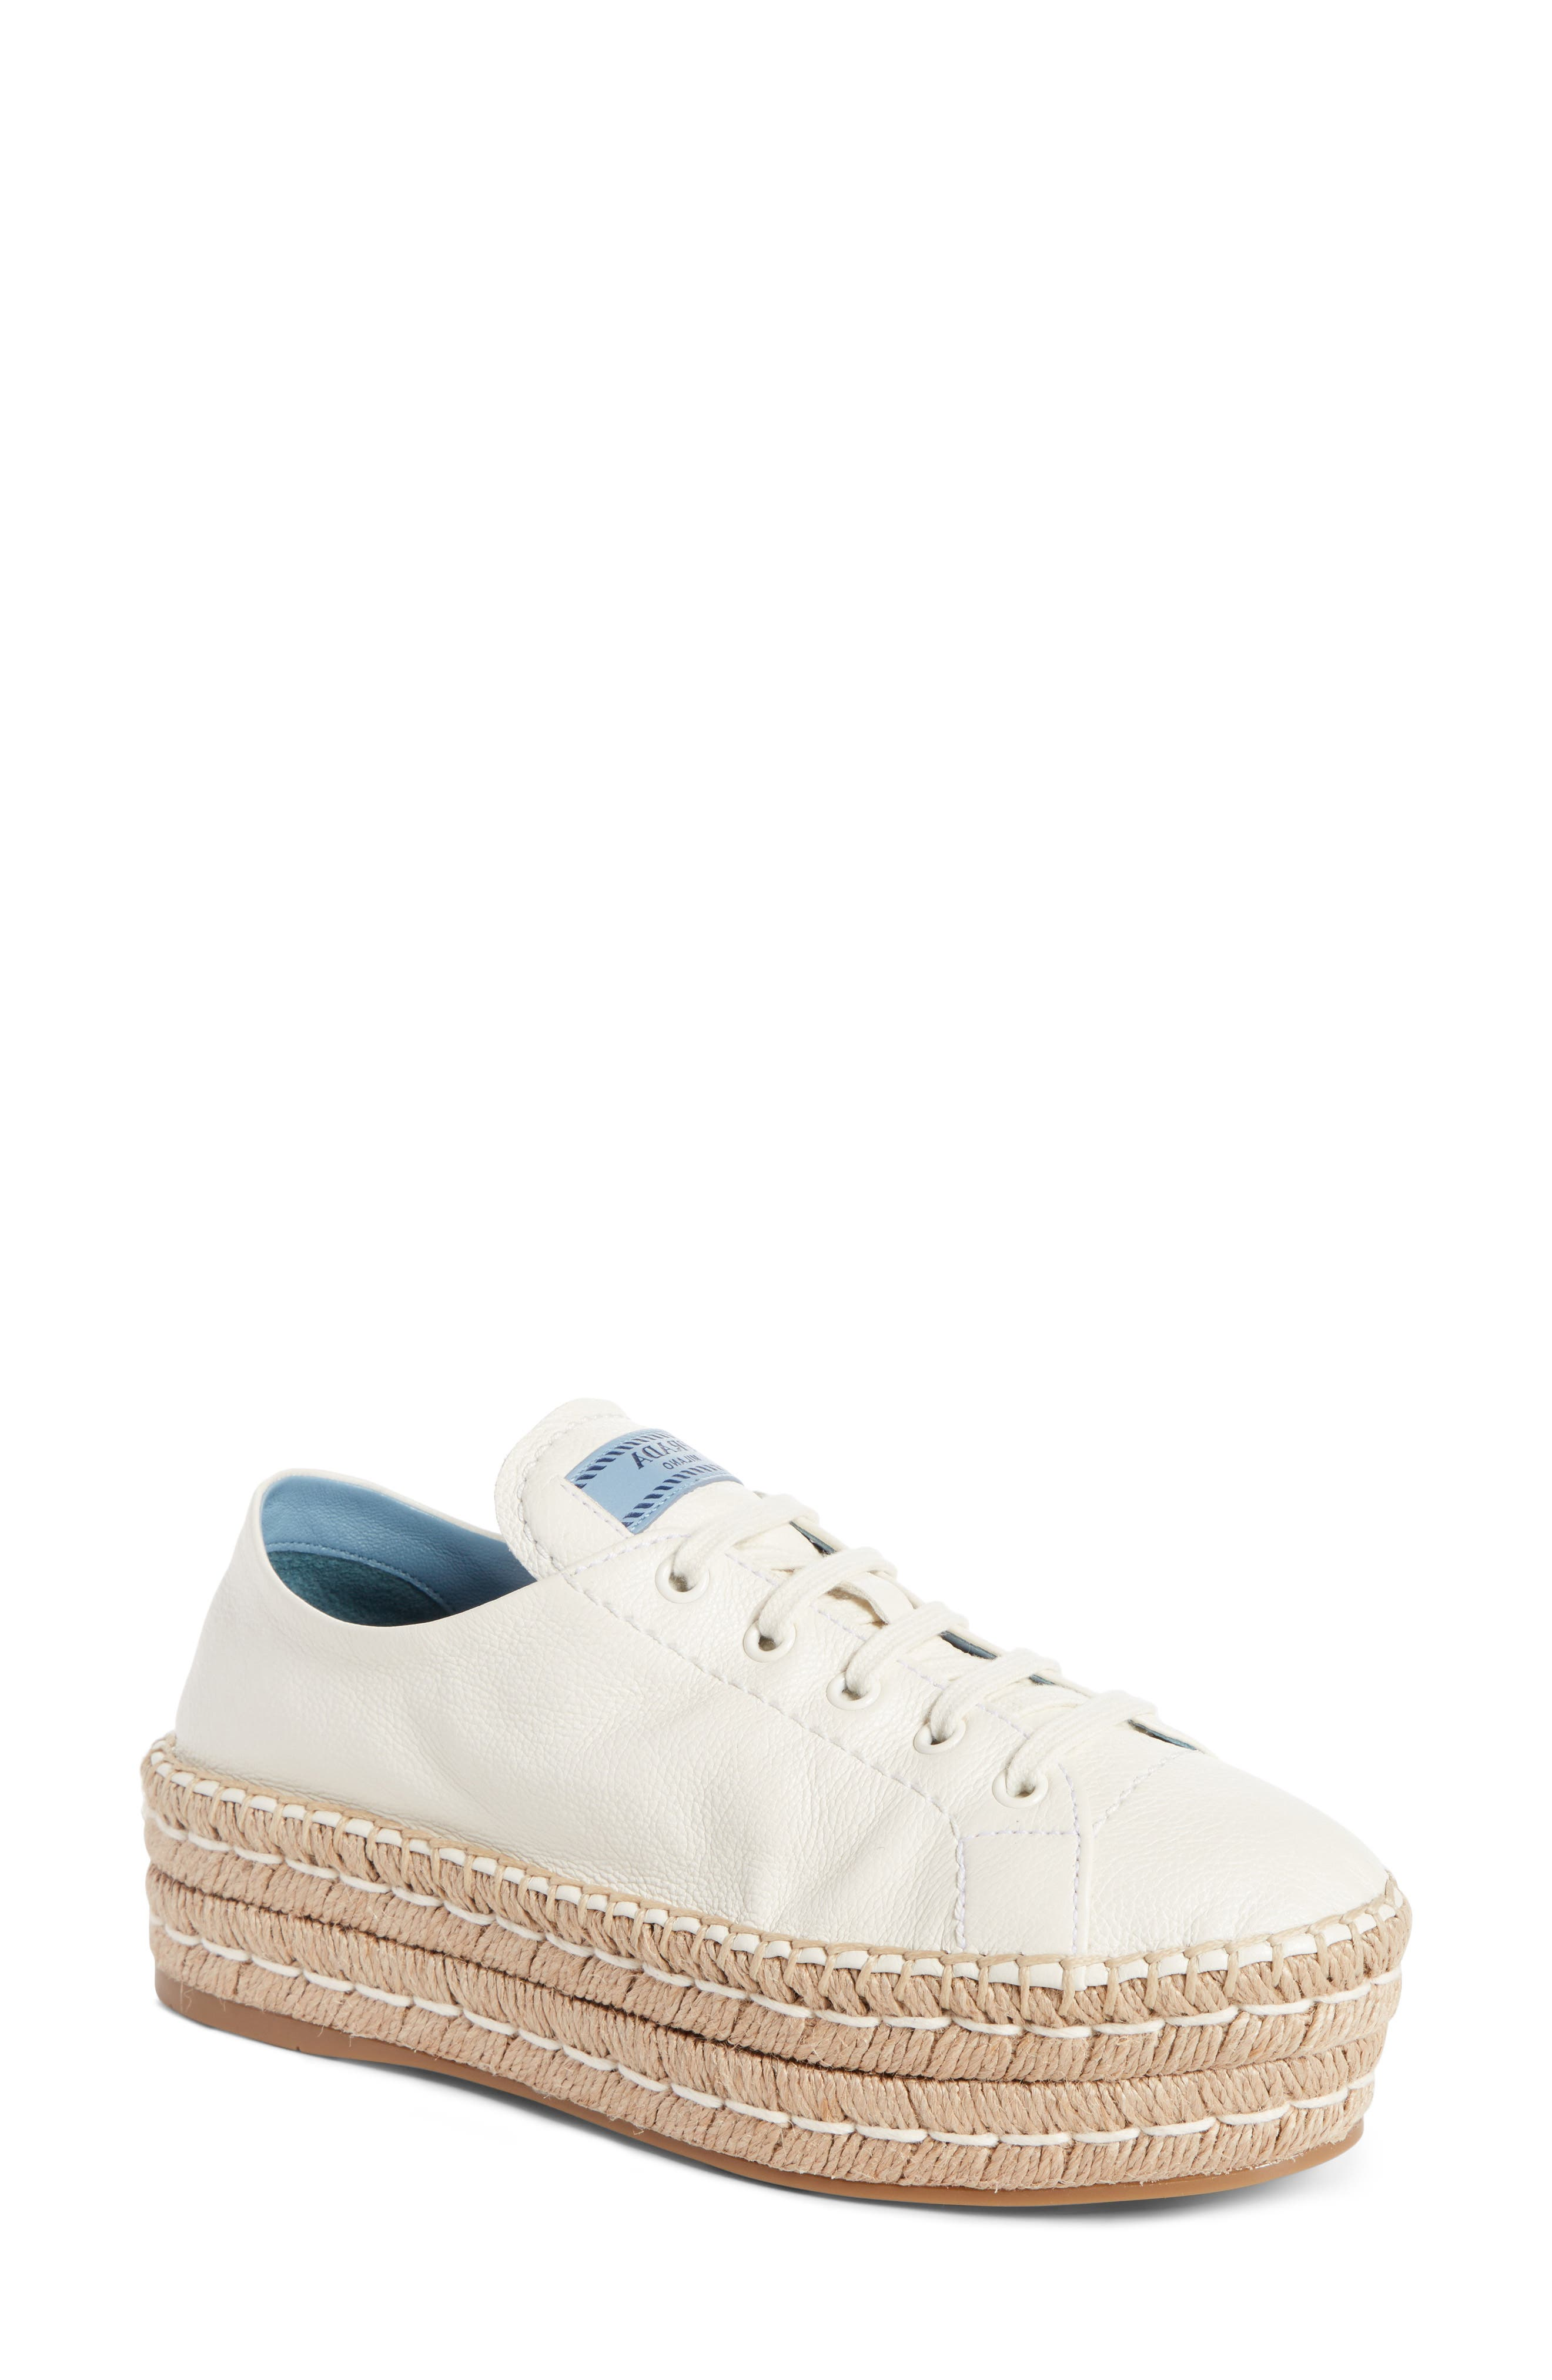 PRADA,                             Flatform Espadrille Sneaker,                             Main thumbnail 1, color,                             WHITE